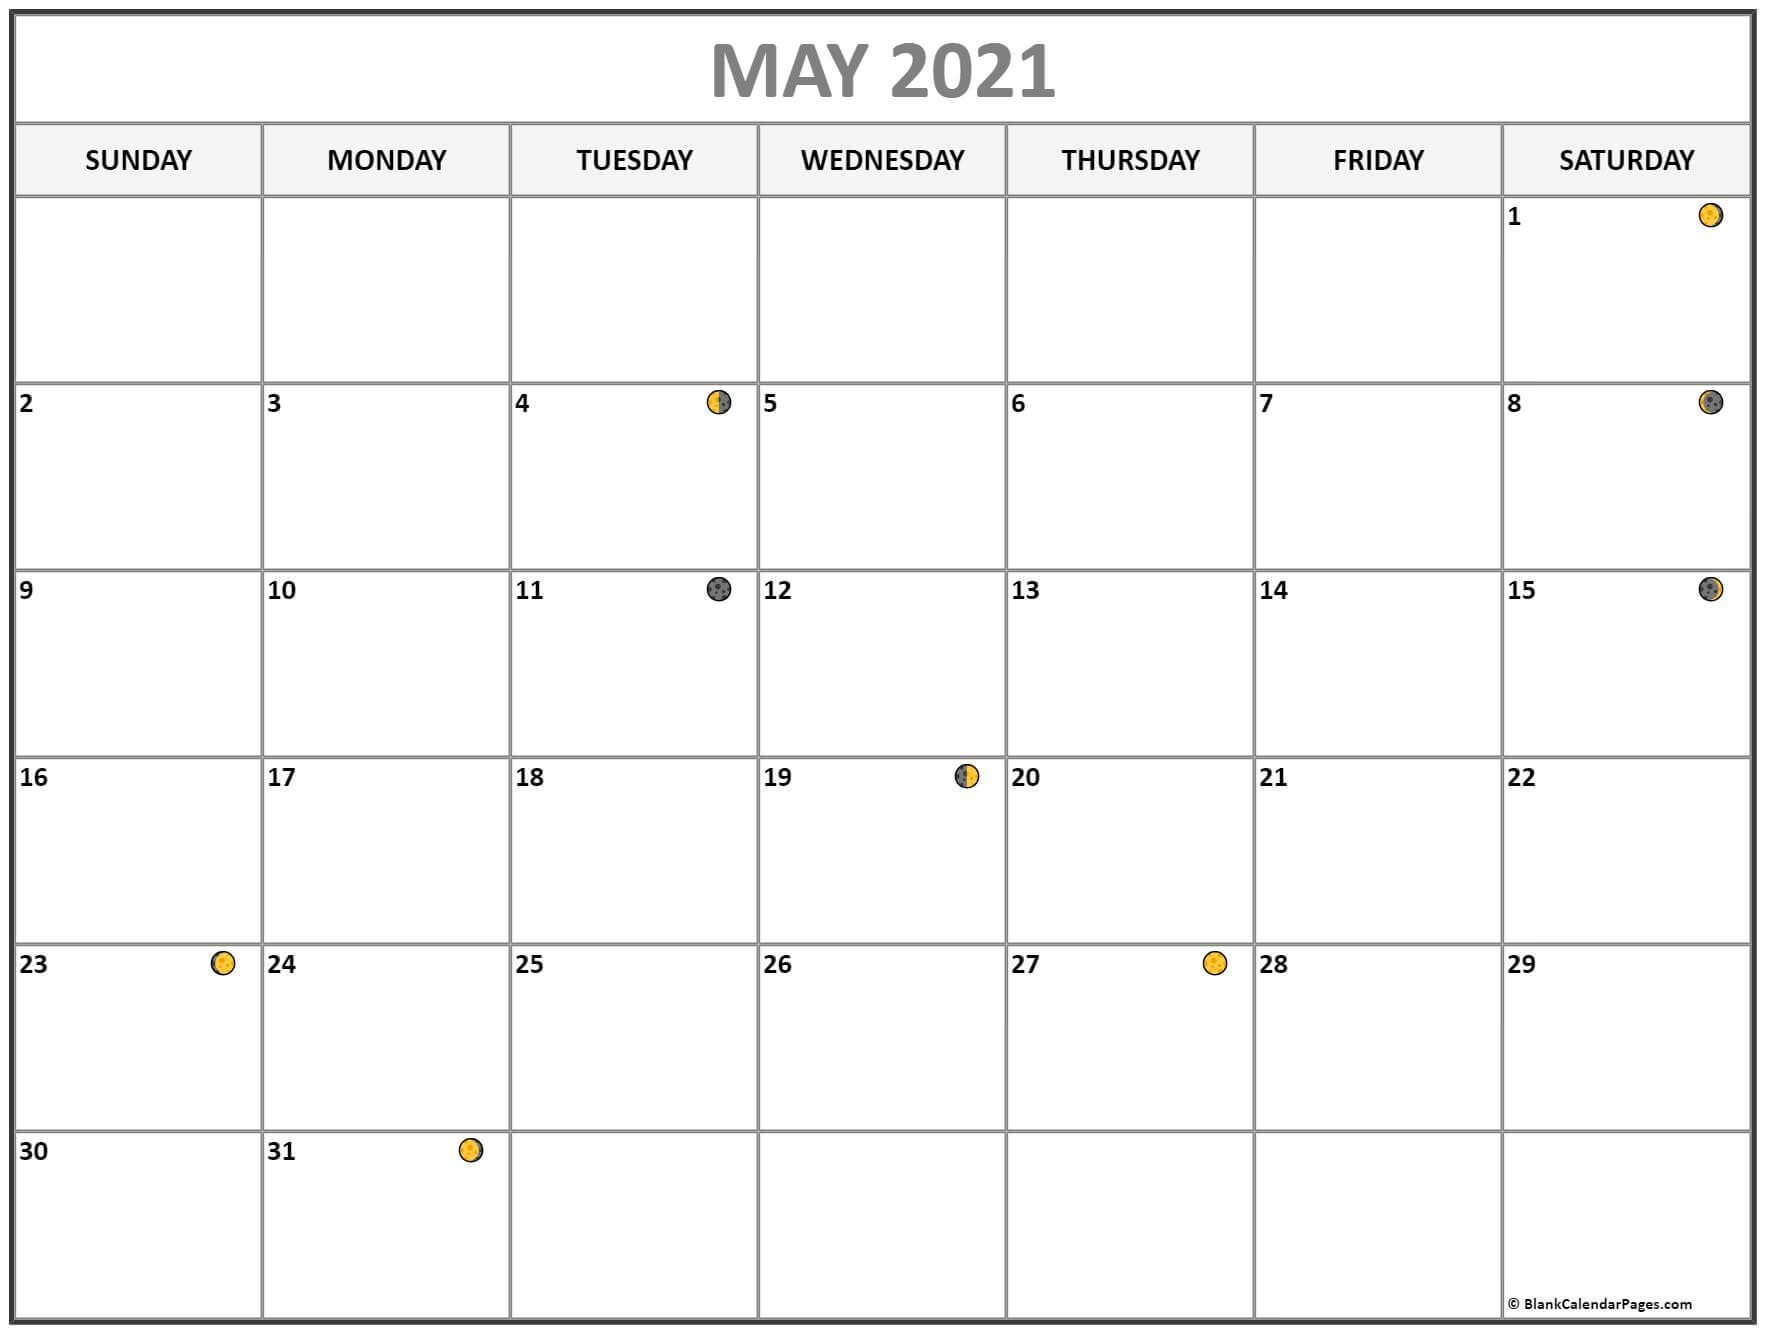 Lunar May 2021 Moon Phases Calendar